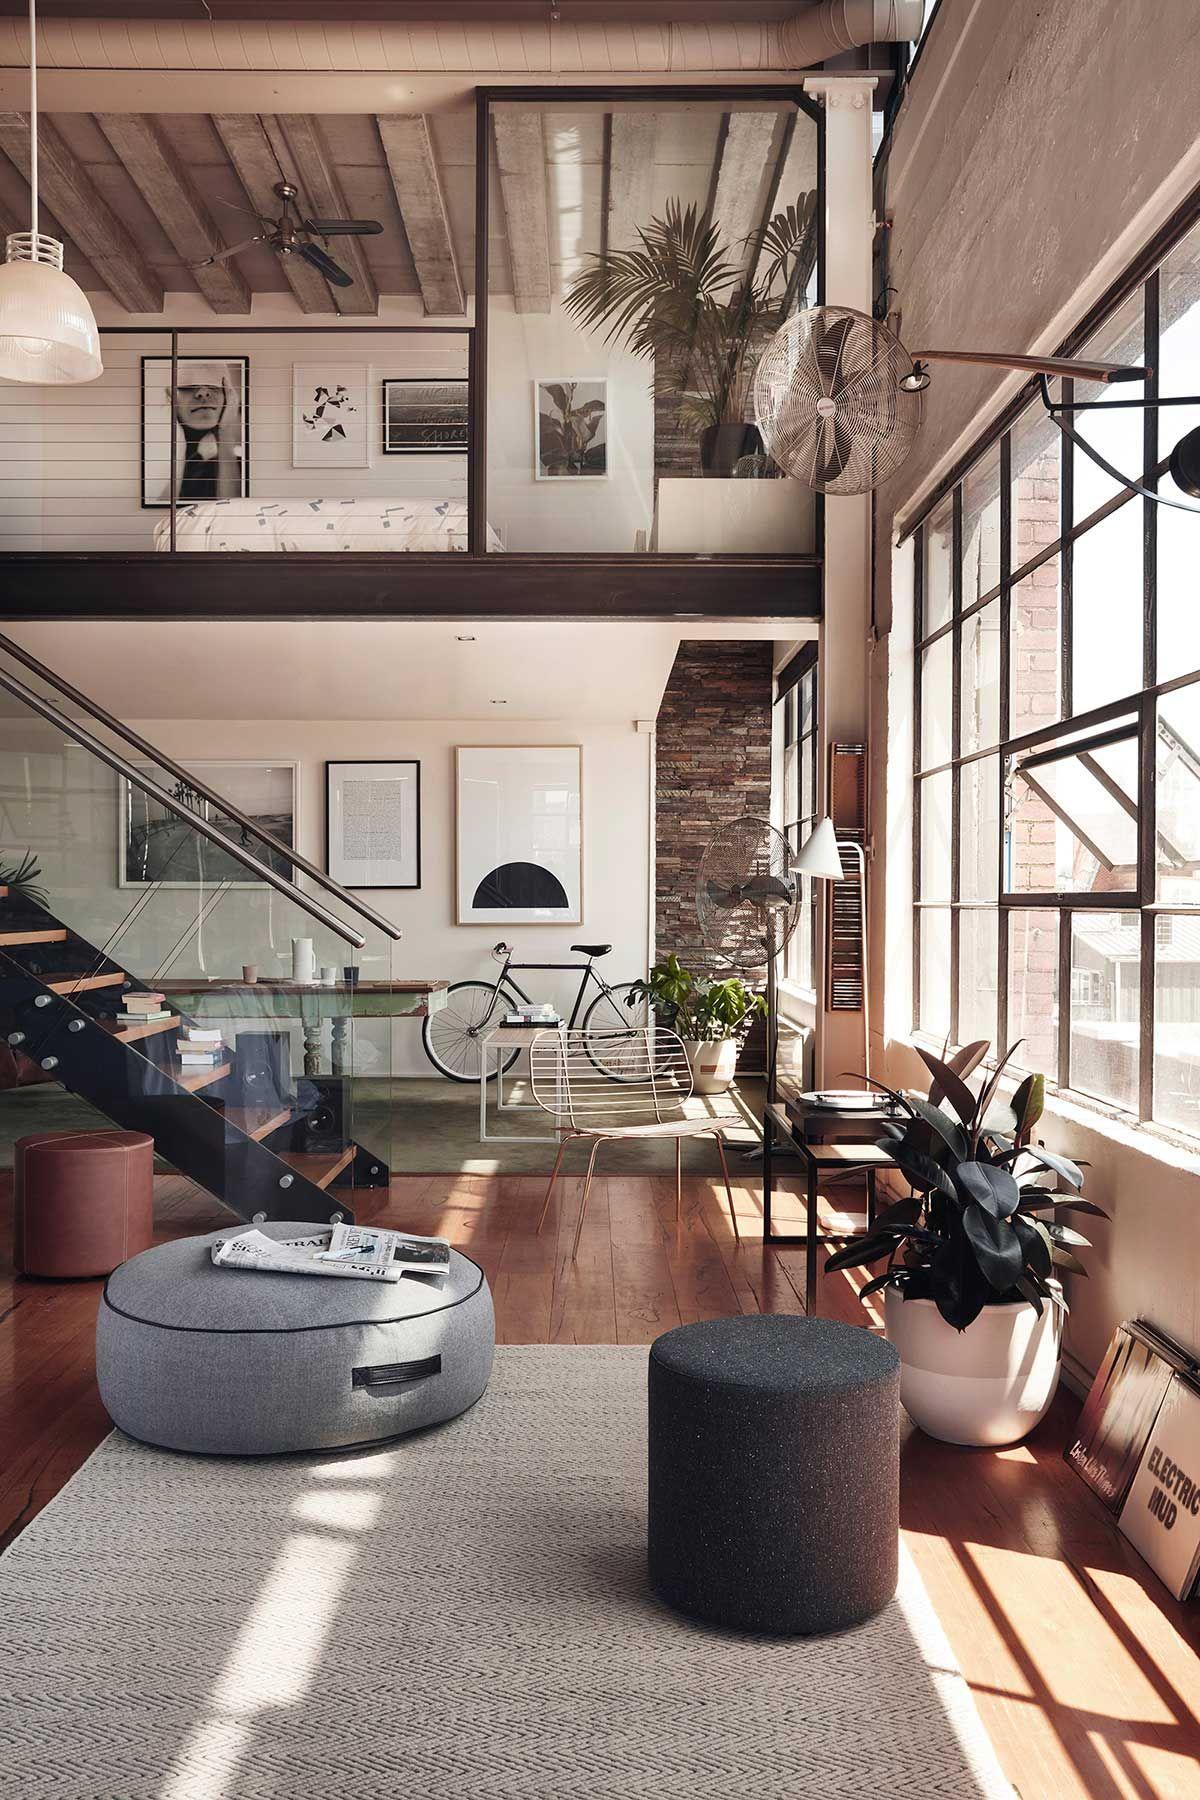 Best Kitchen Gallery: Диалоги House Pinterest Lofts Interiors And Loft Studio of Industrial Design Homes  on rachelxblog.com